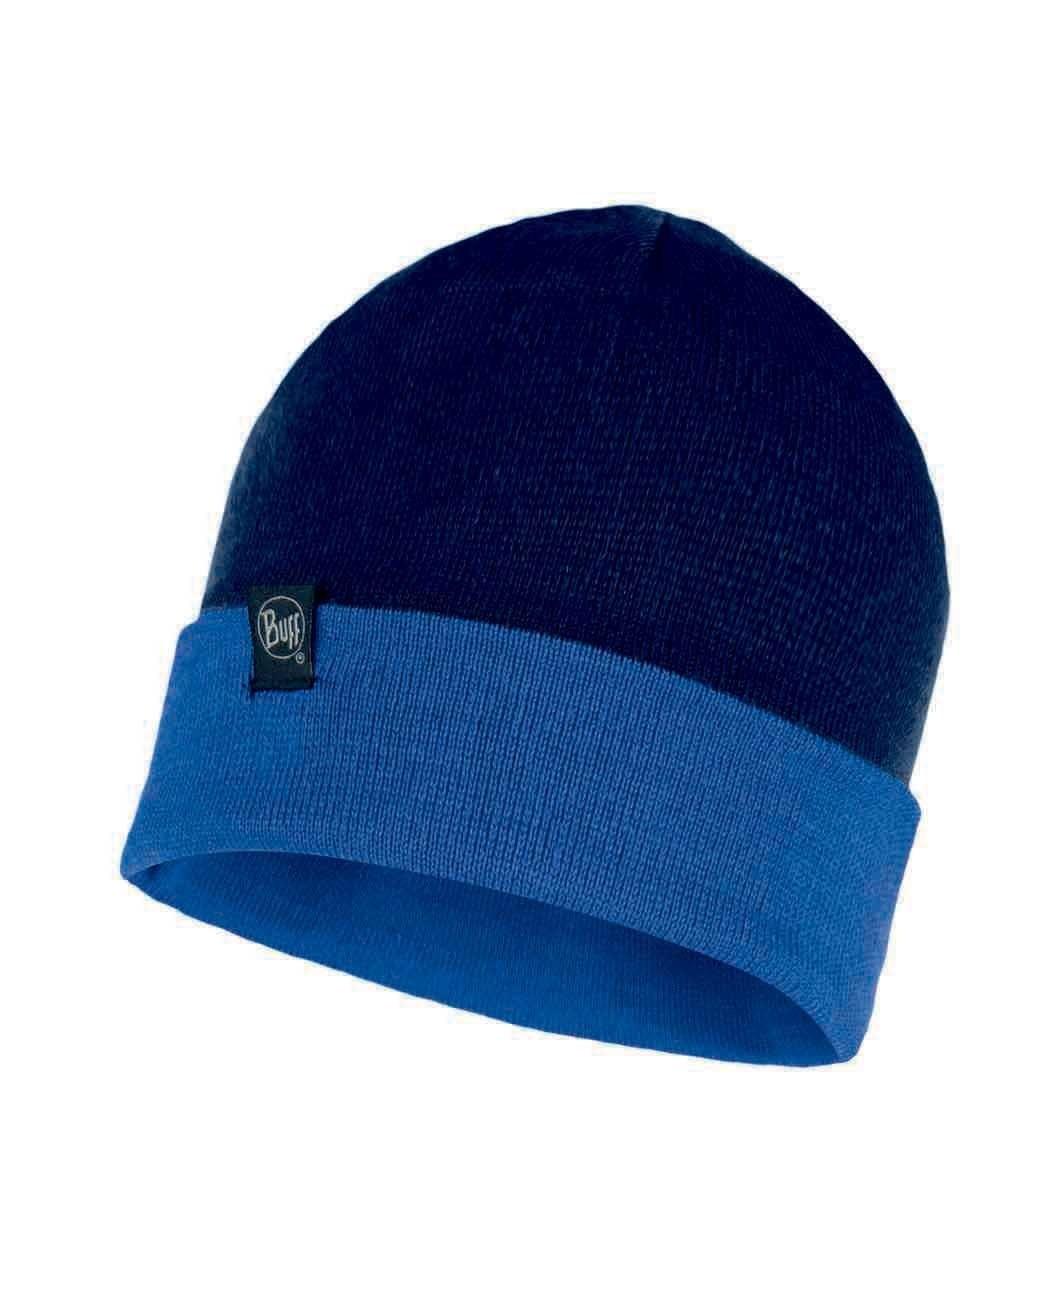 Вязаная шапка Buff Hat Knitted Dub Dark Denim